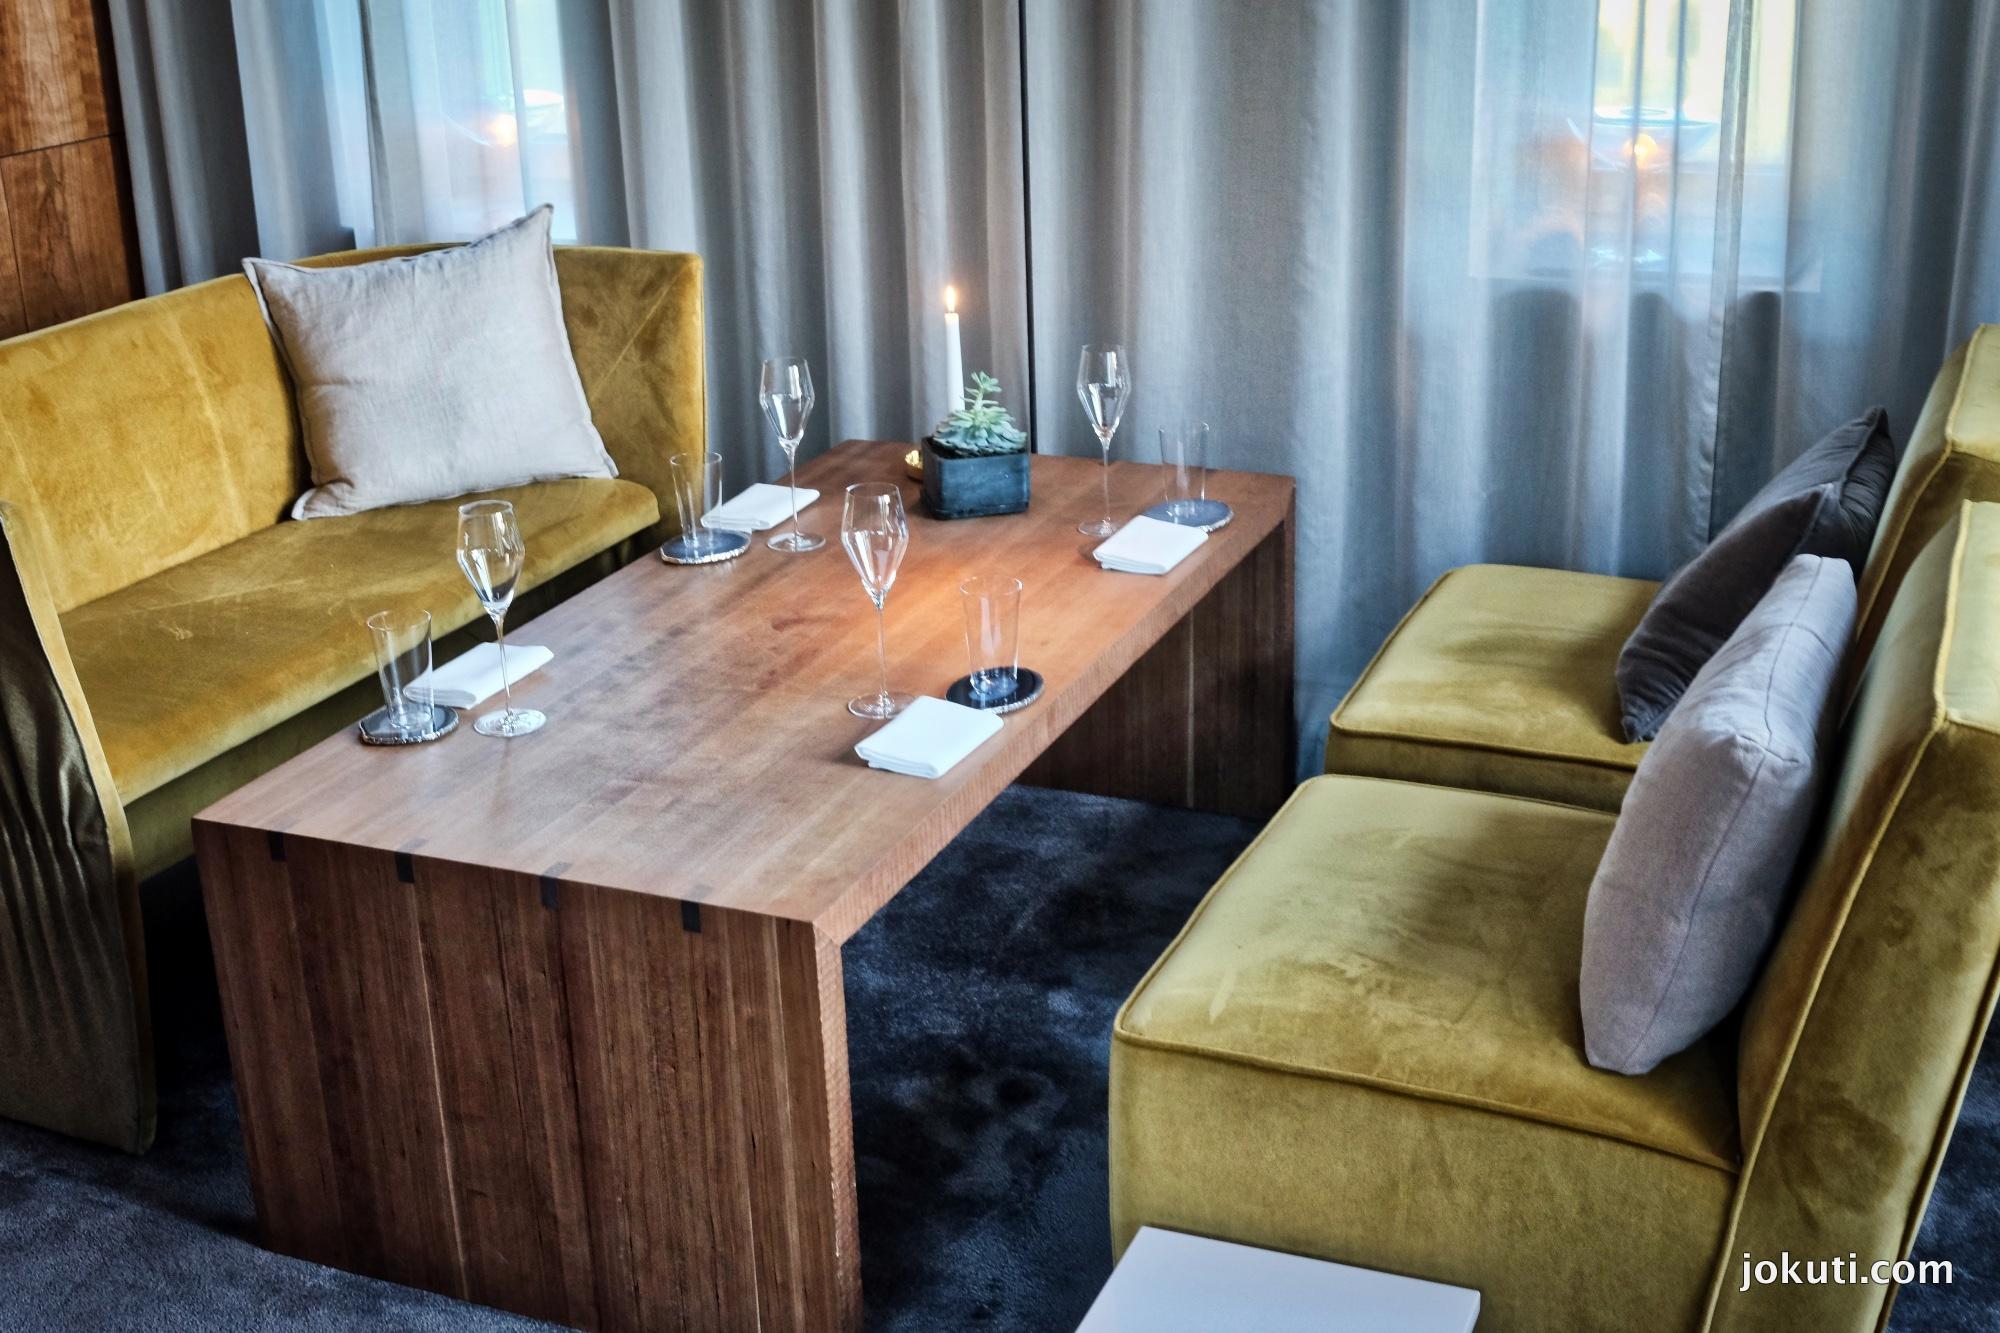 dscf5364_frantzen_stockholm_restaurant_michelin_stars_sweden_vilagevo_jokuti_l.jpg